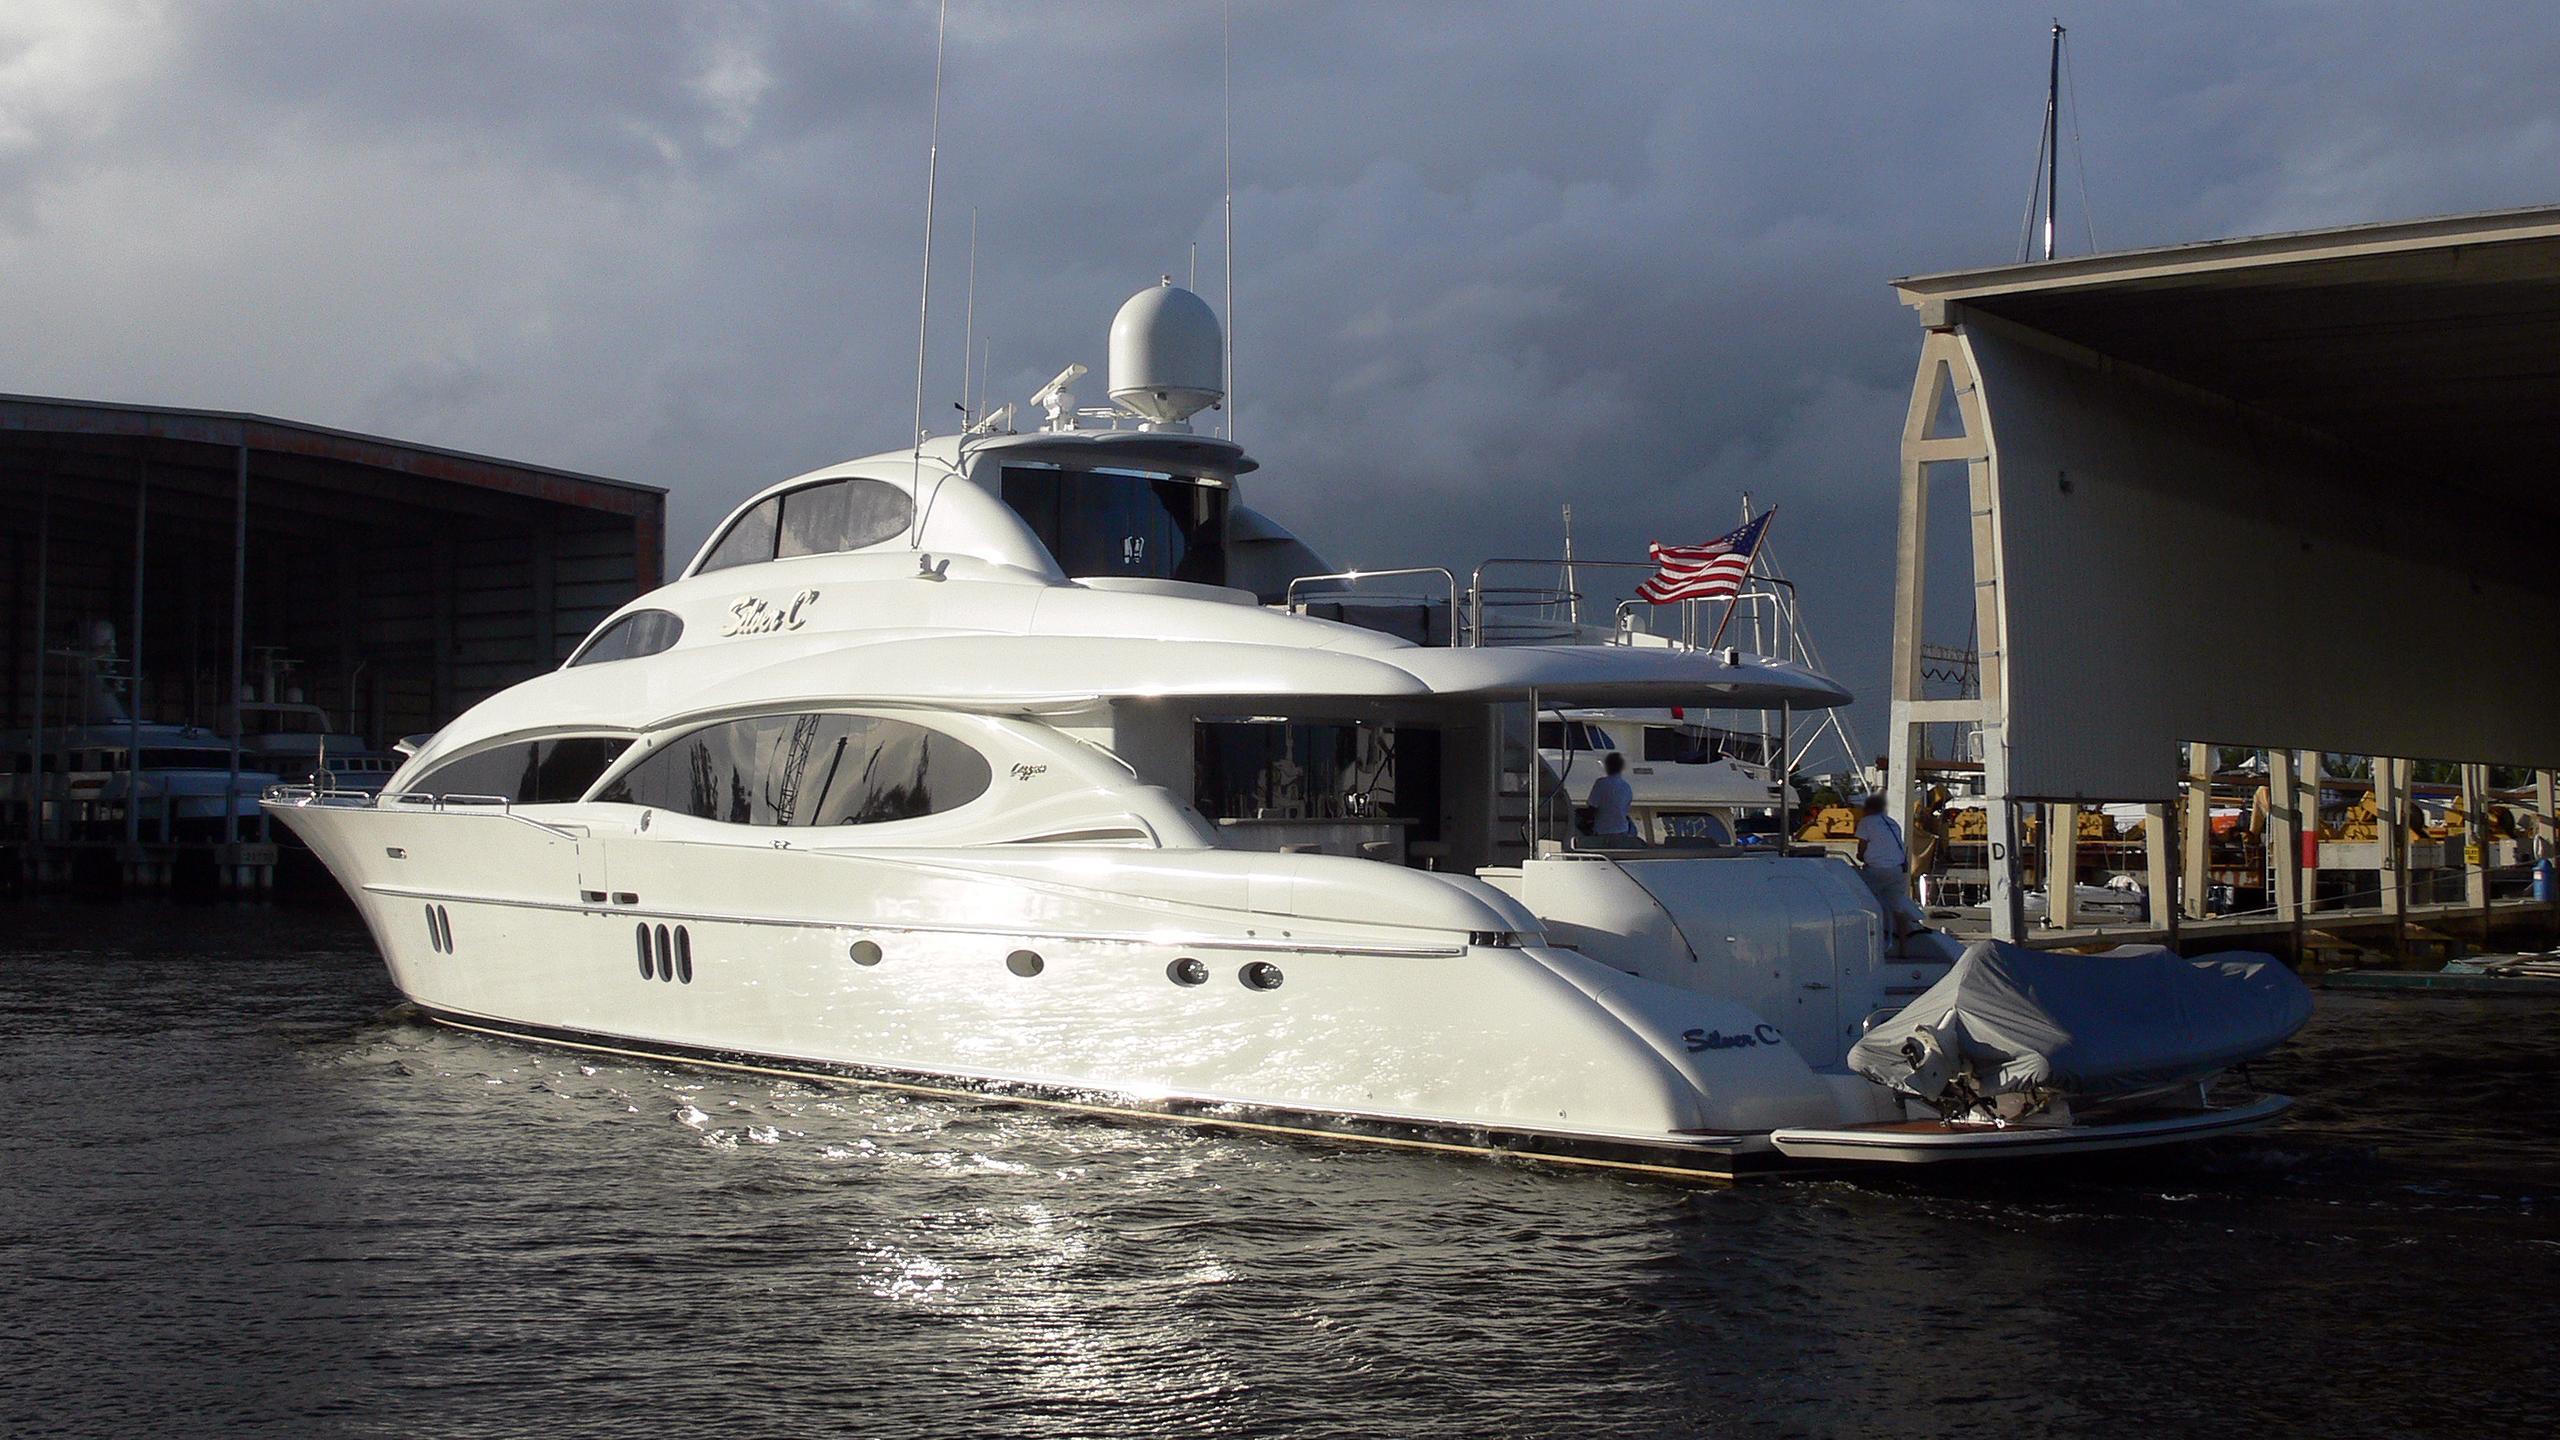 the-beeliever-halftime-motor-yacht-lazzara-2005-33m-half-profile